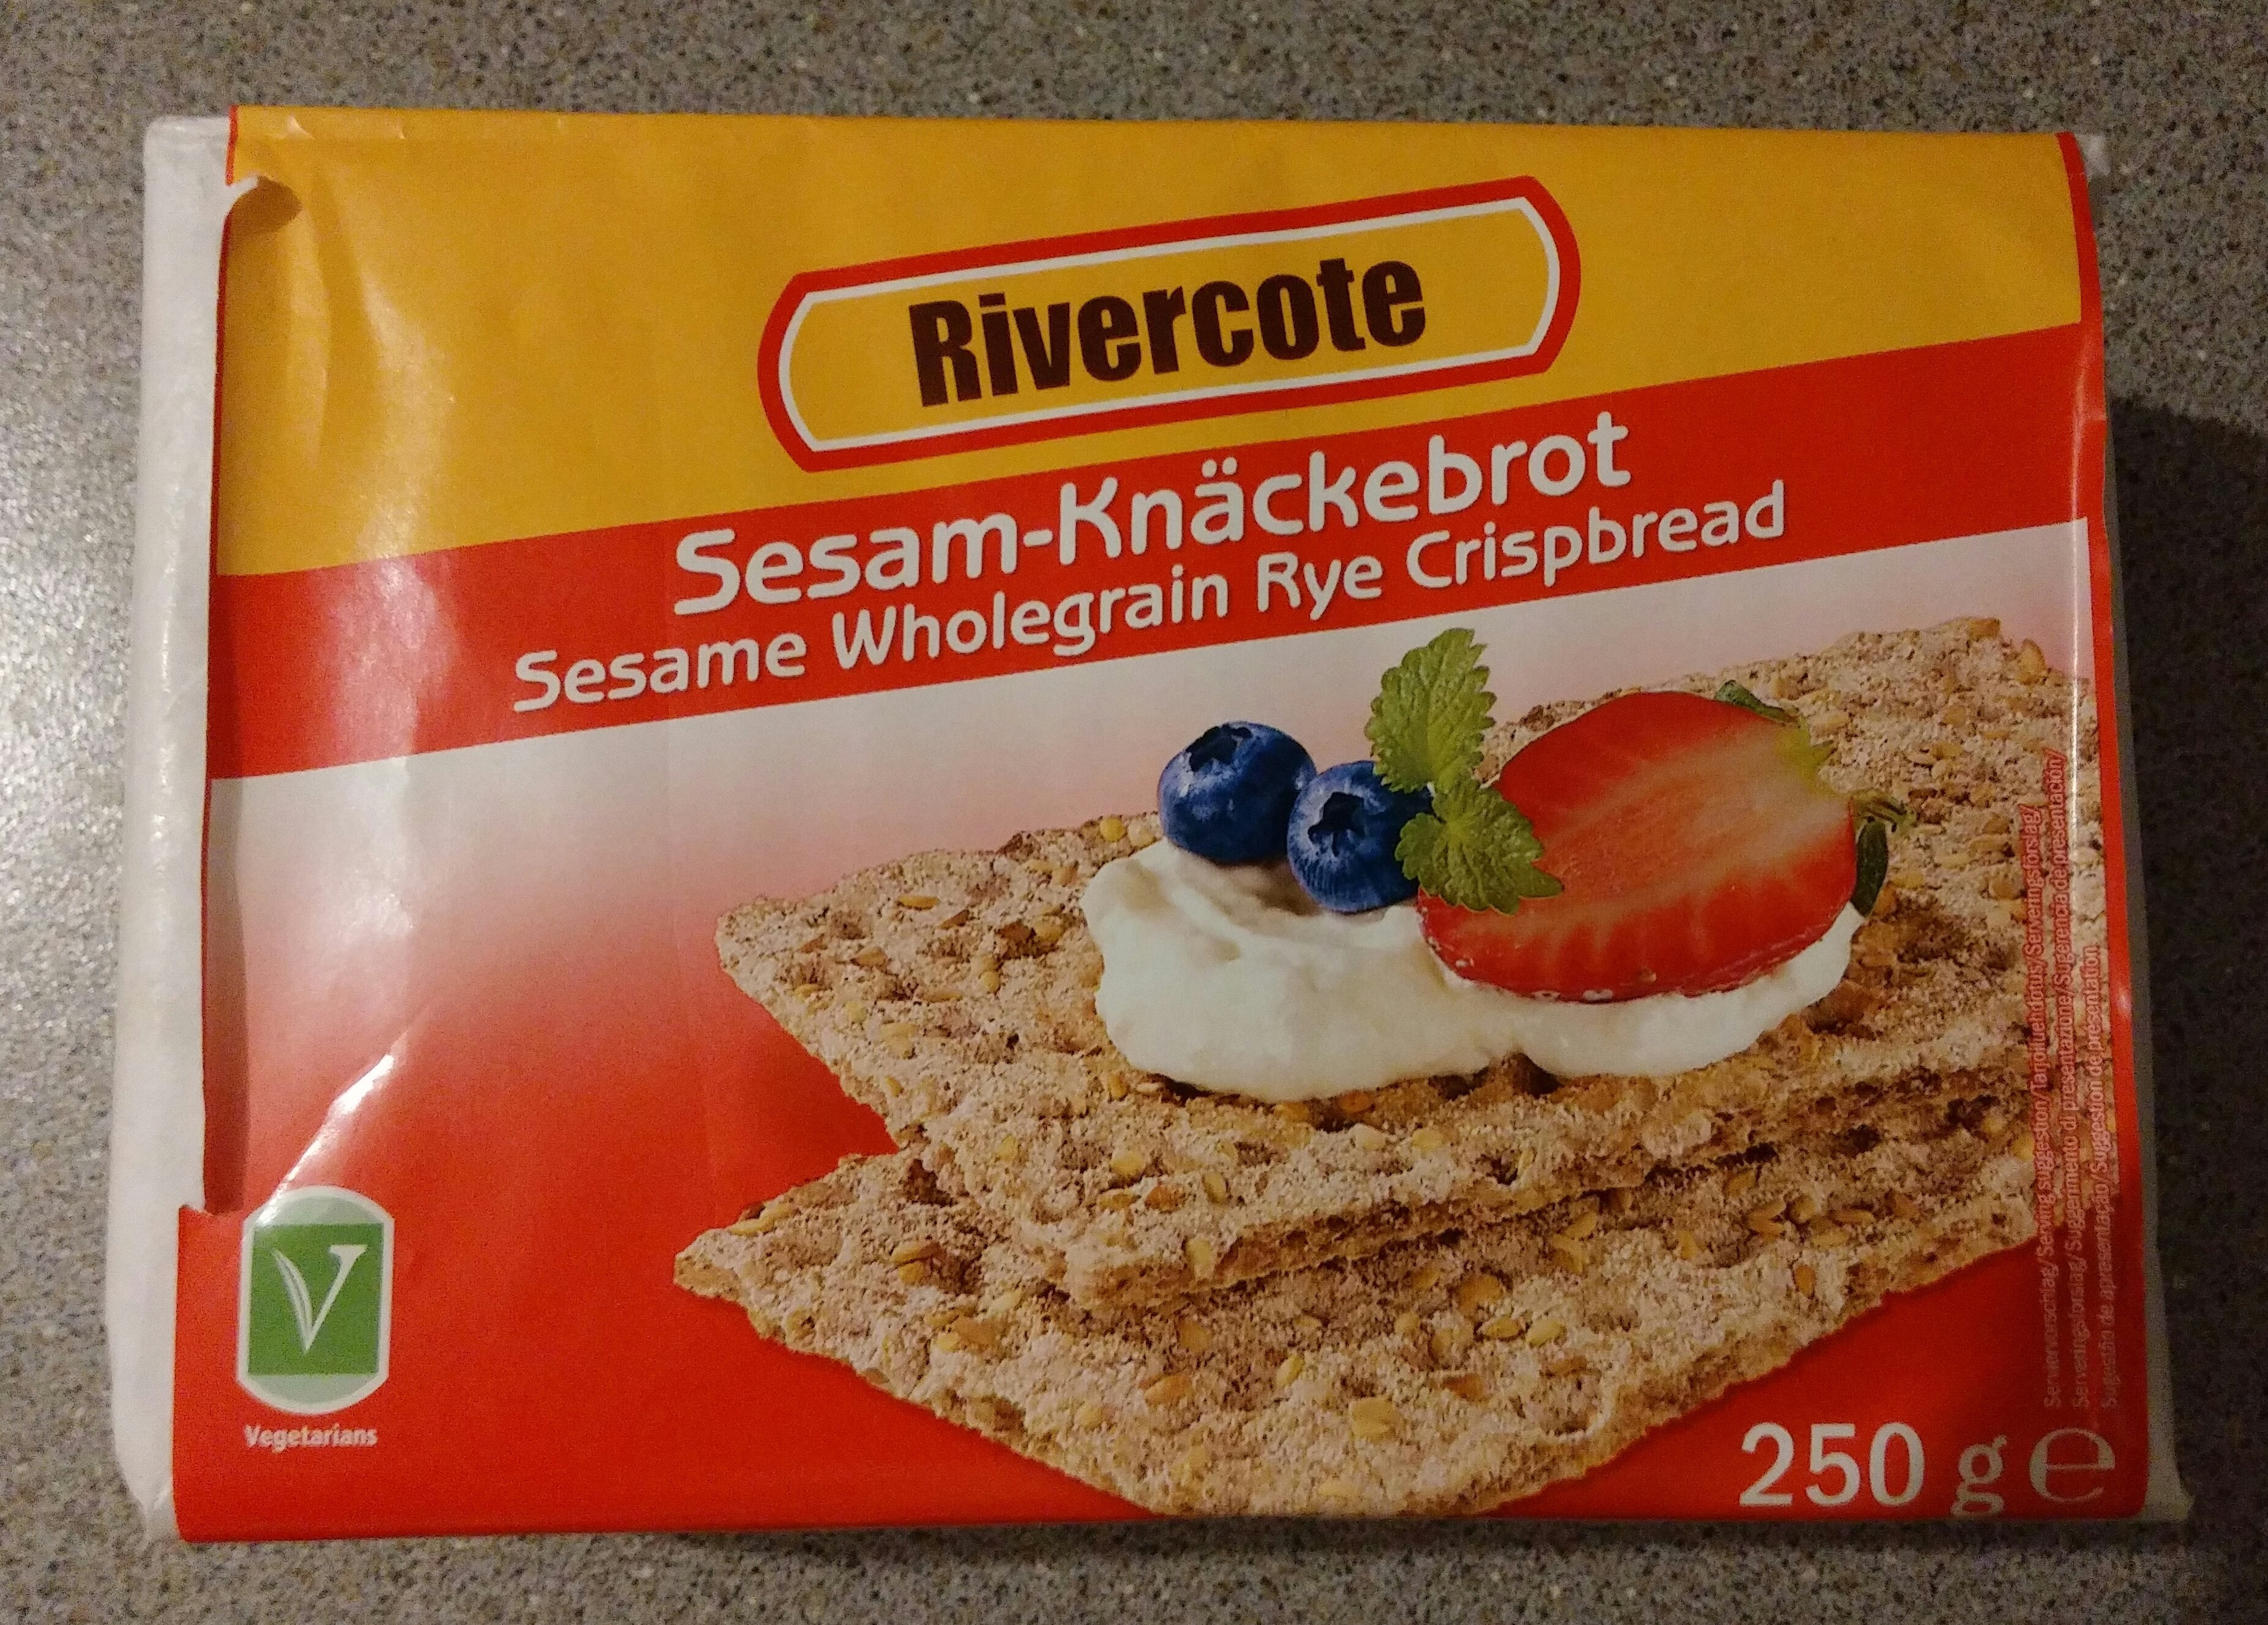 Sesame Wholegrain Rye Crispbread (250g)